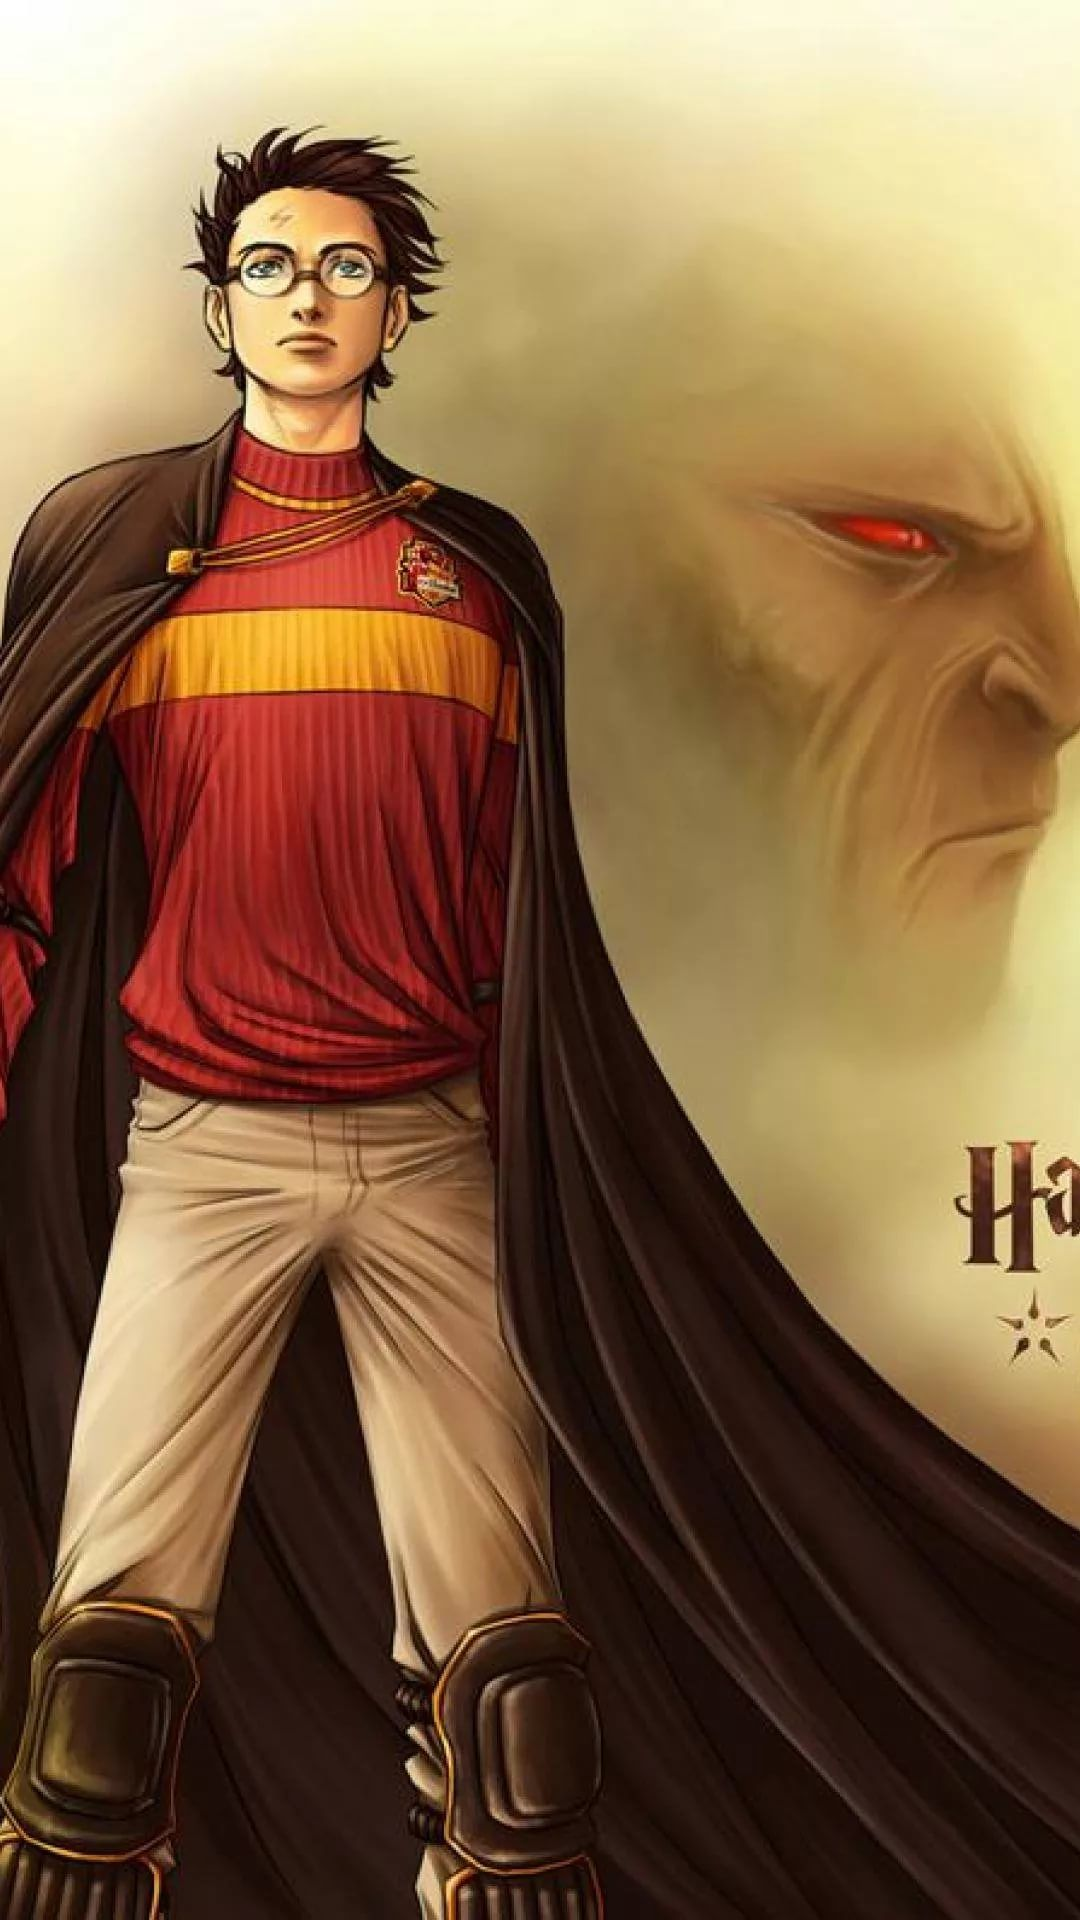 Harry Potter phone wallpaper